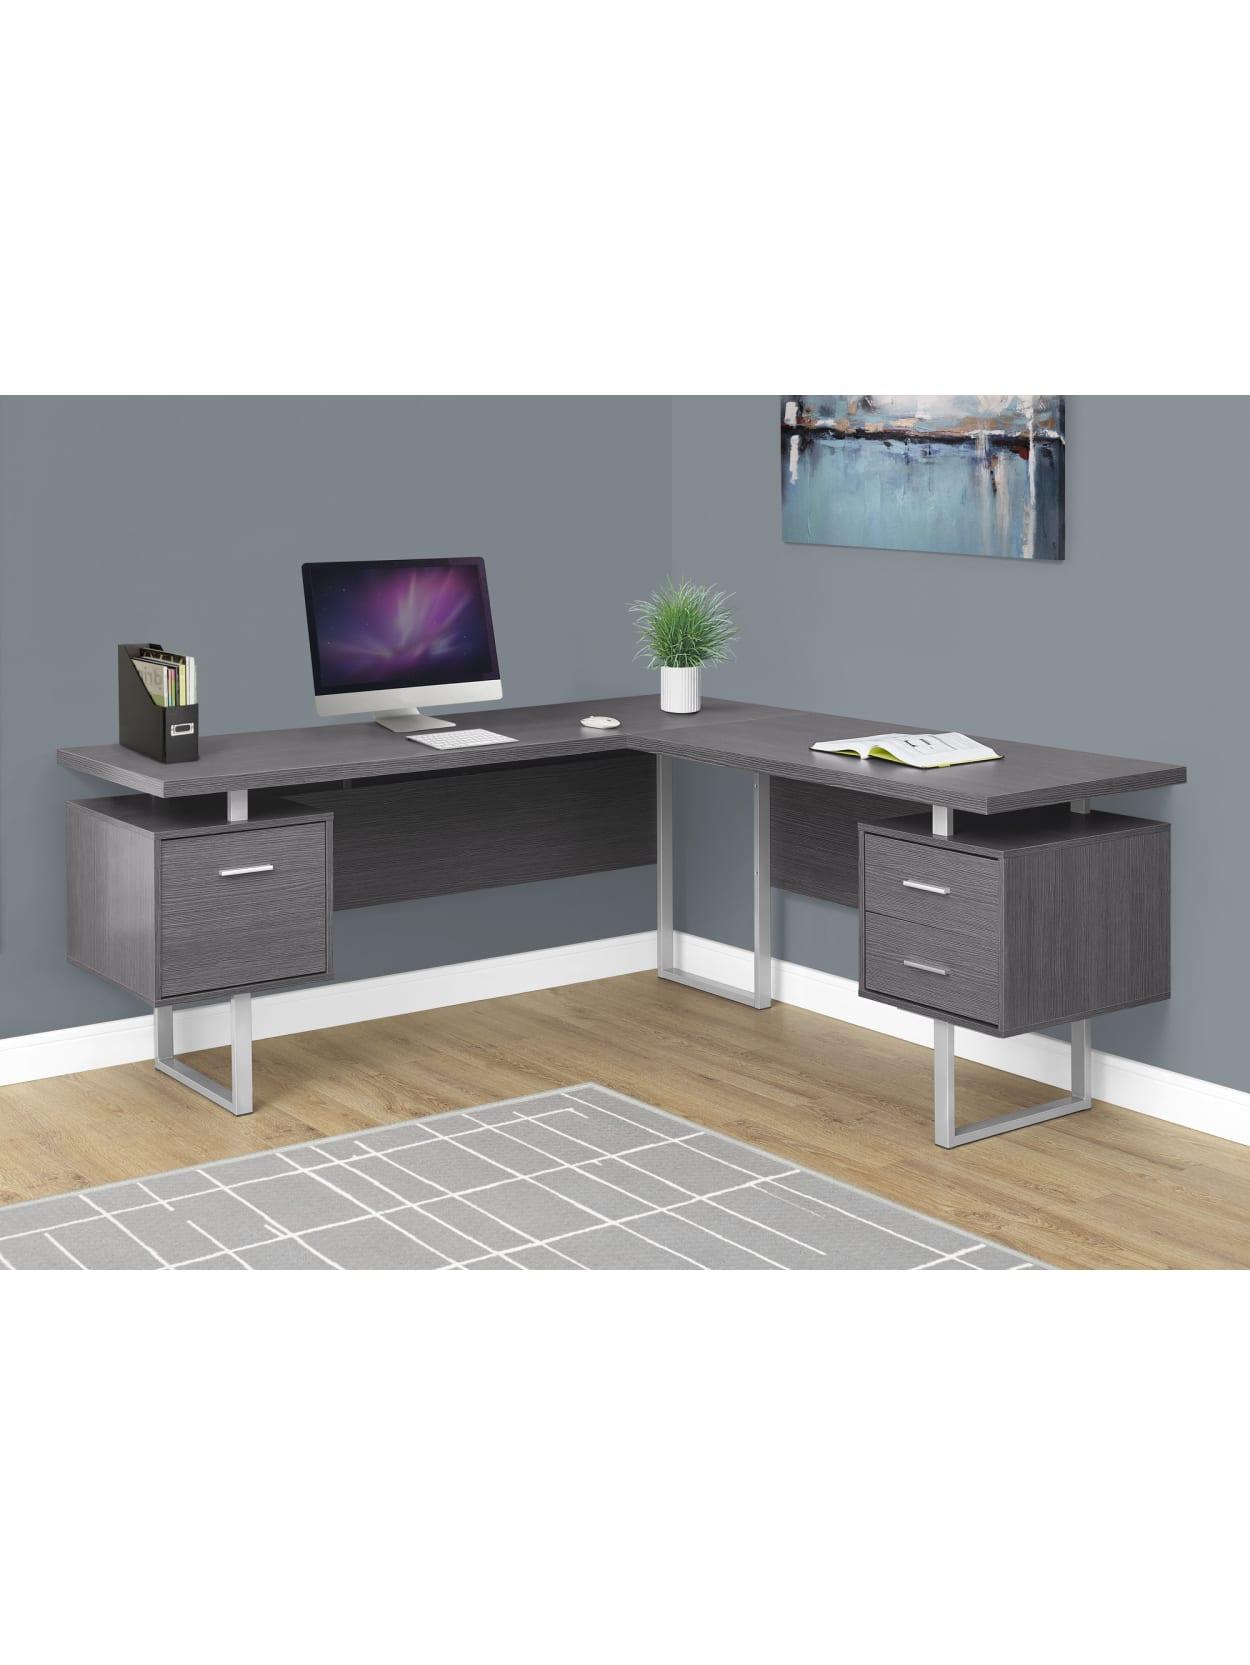 Monarch Specialties L Shaped Desk Gray - Office Depot